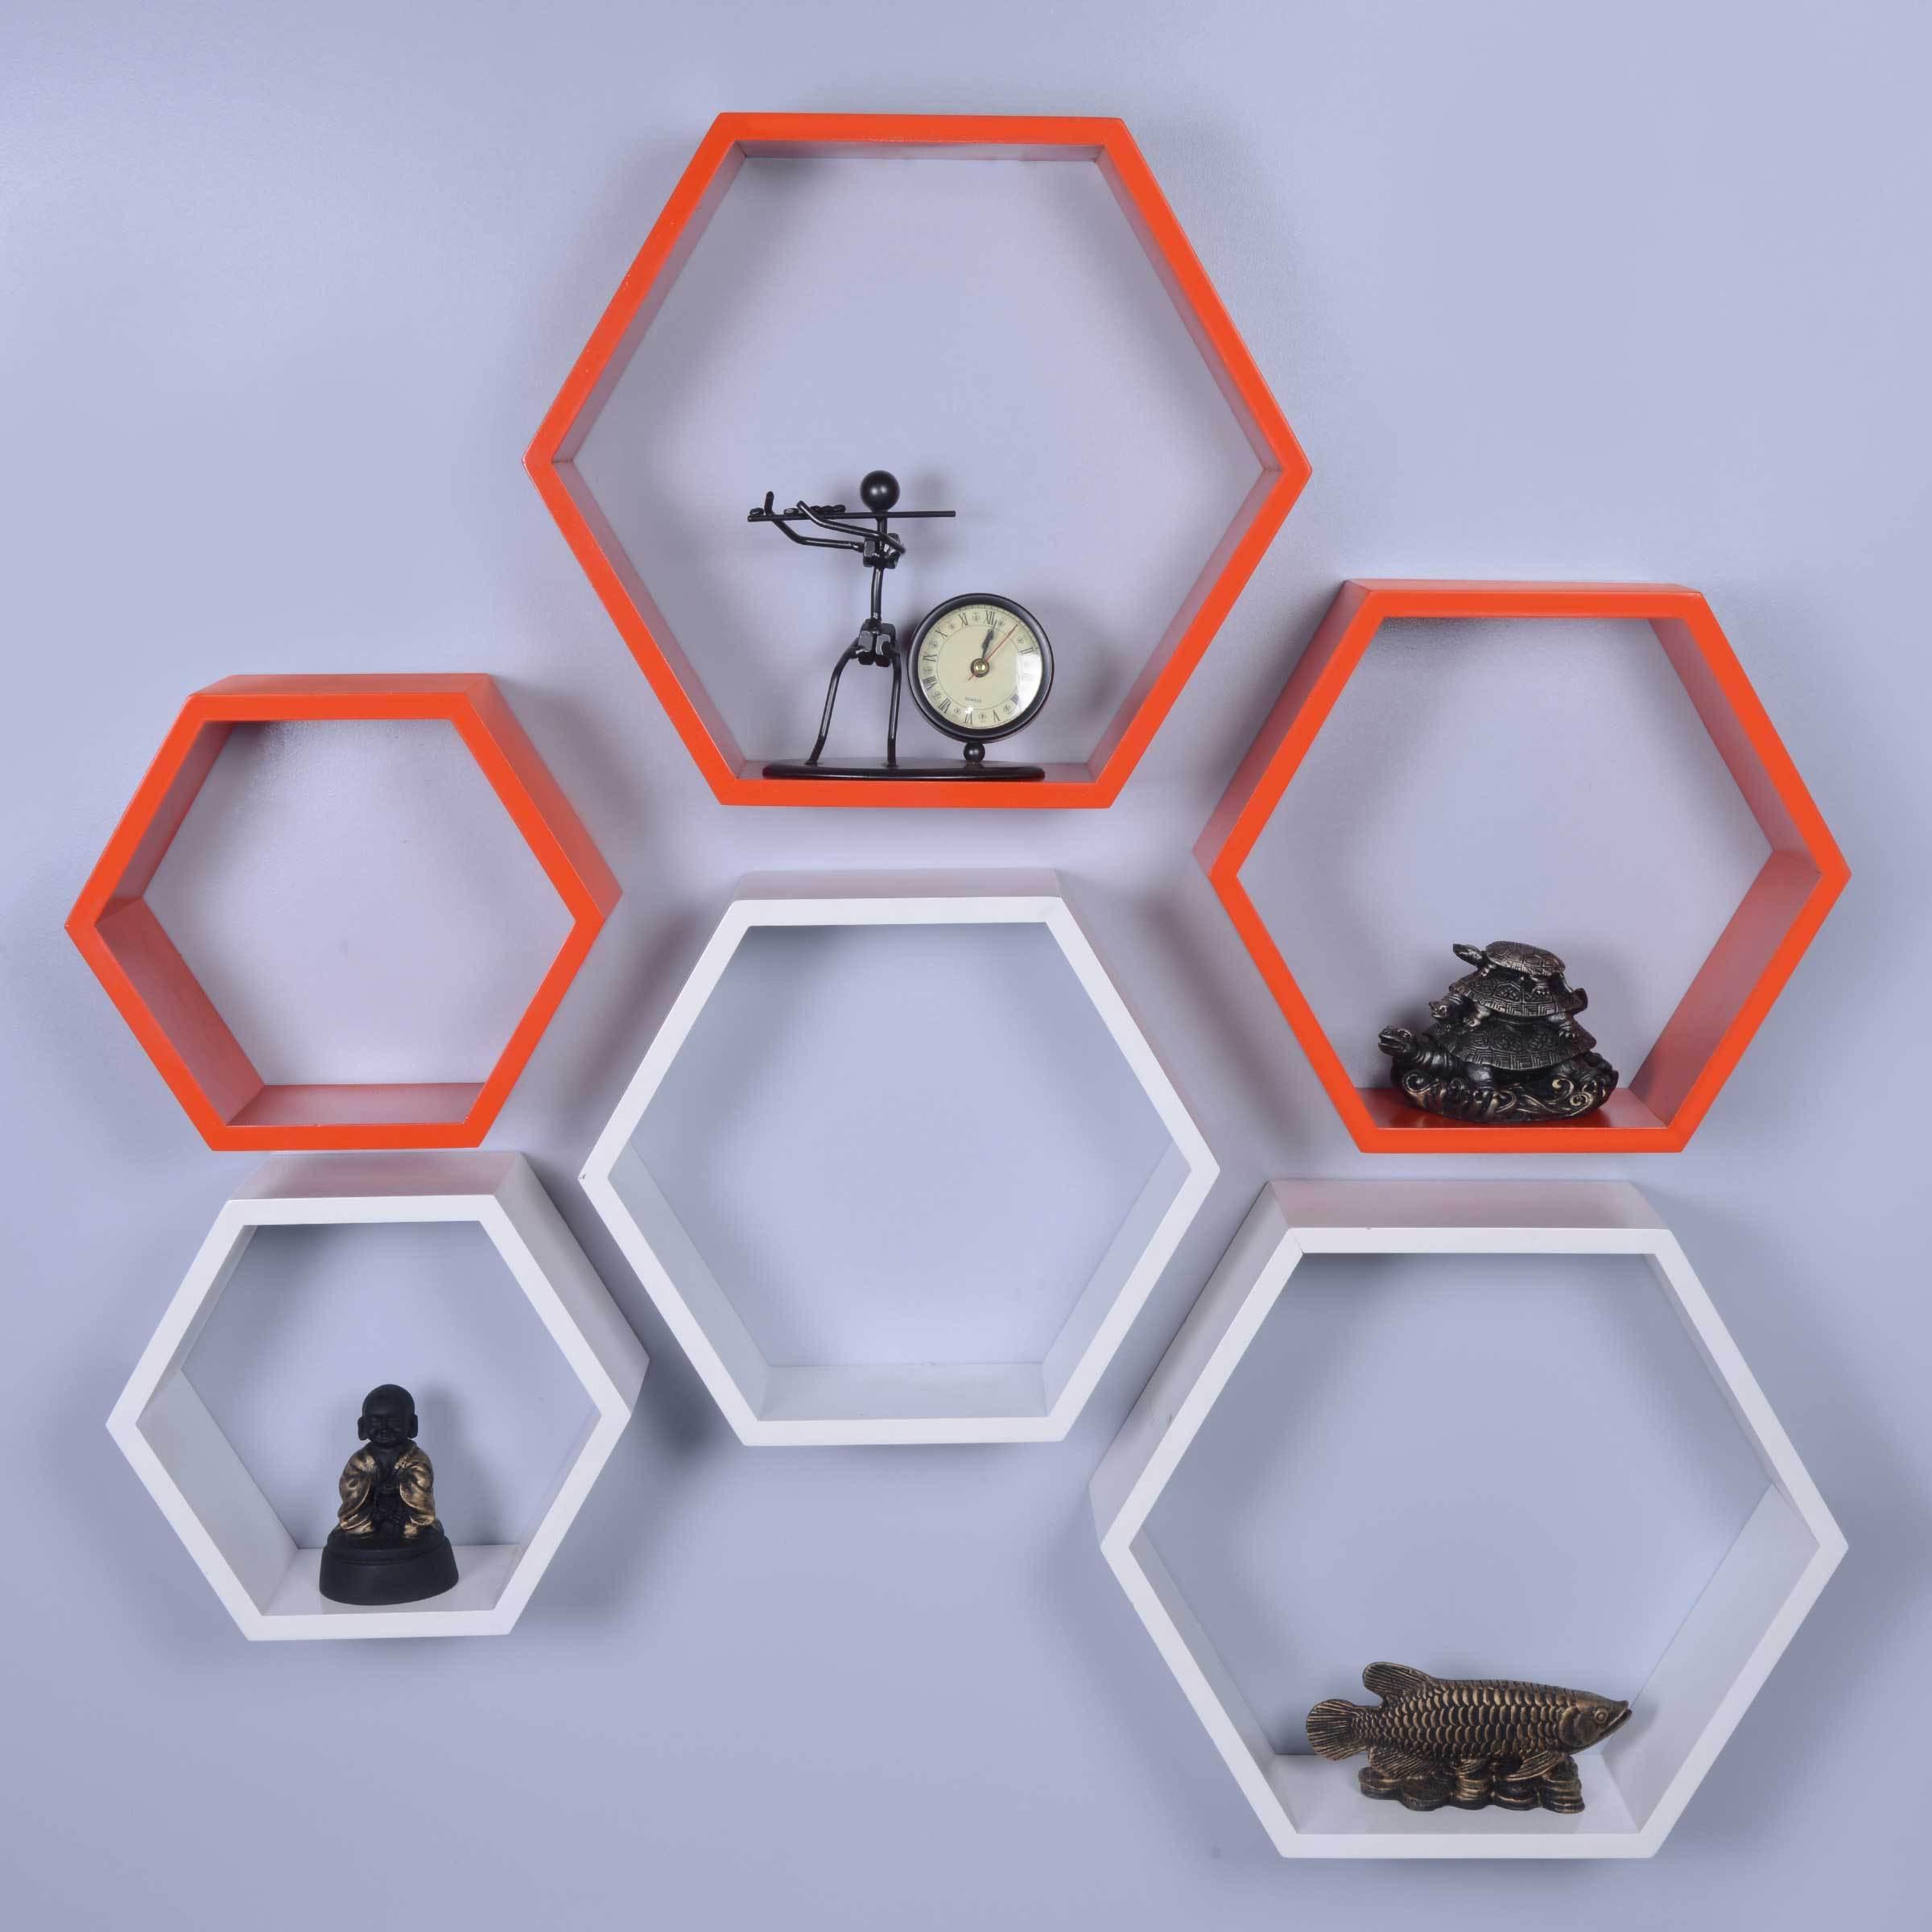 View Dcjc Dcjc Hexagon Shelf Orange/White - Set Of 6 MDF Wall Shelf(Number of Shelves - 6, Multicolor) Furniture (Dcjc)